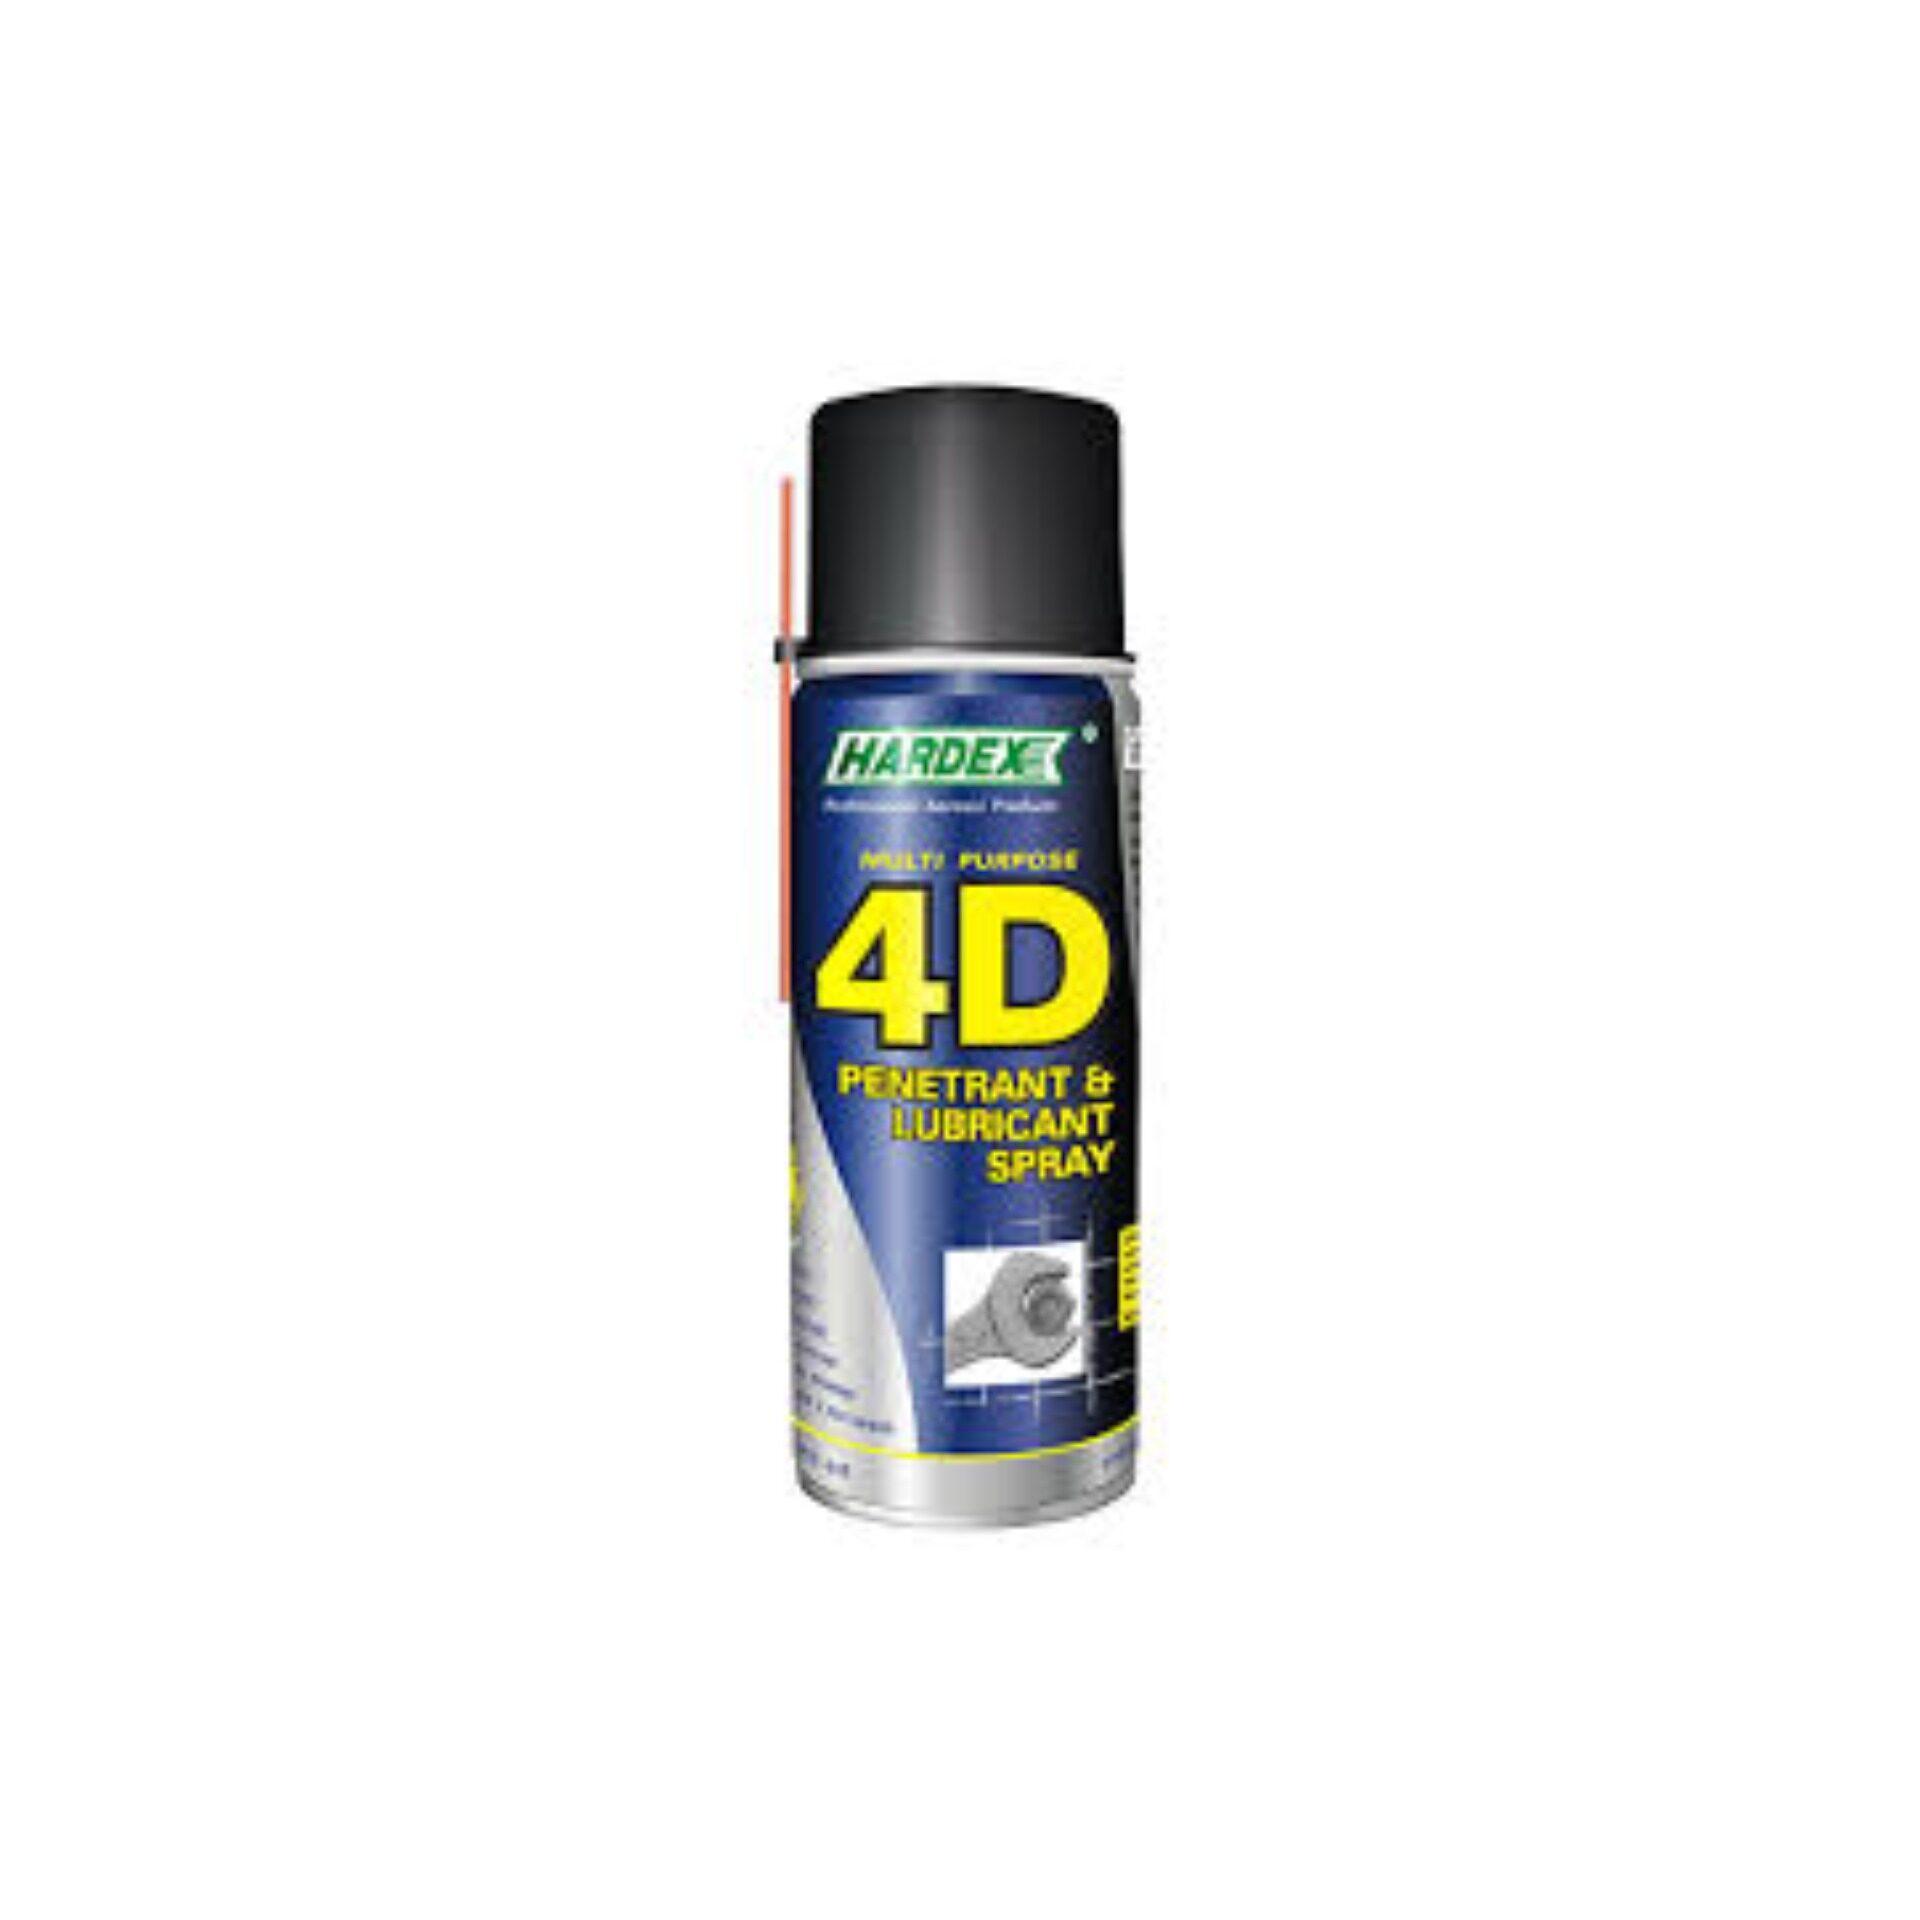 HD420 HARDEX 4D PENETRANT & LUBRICANT SPRAY 200ML